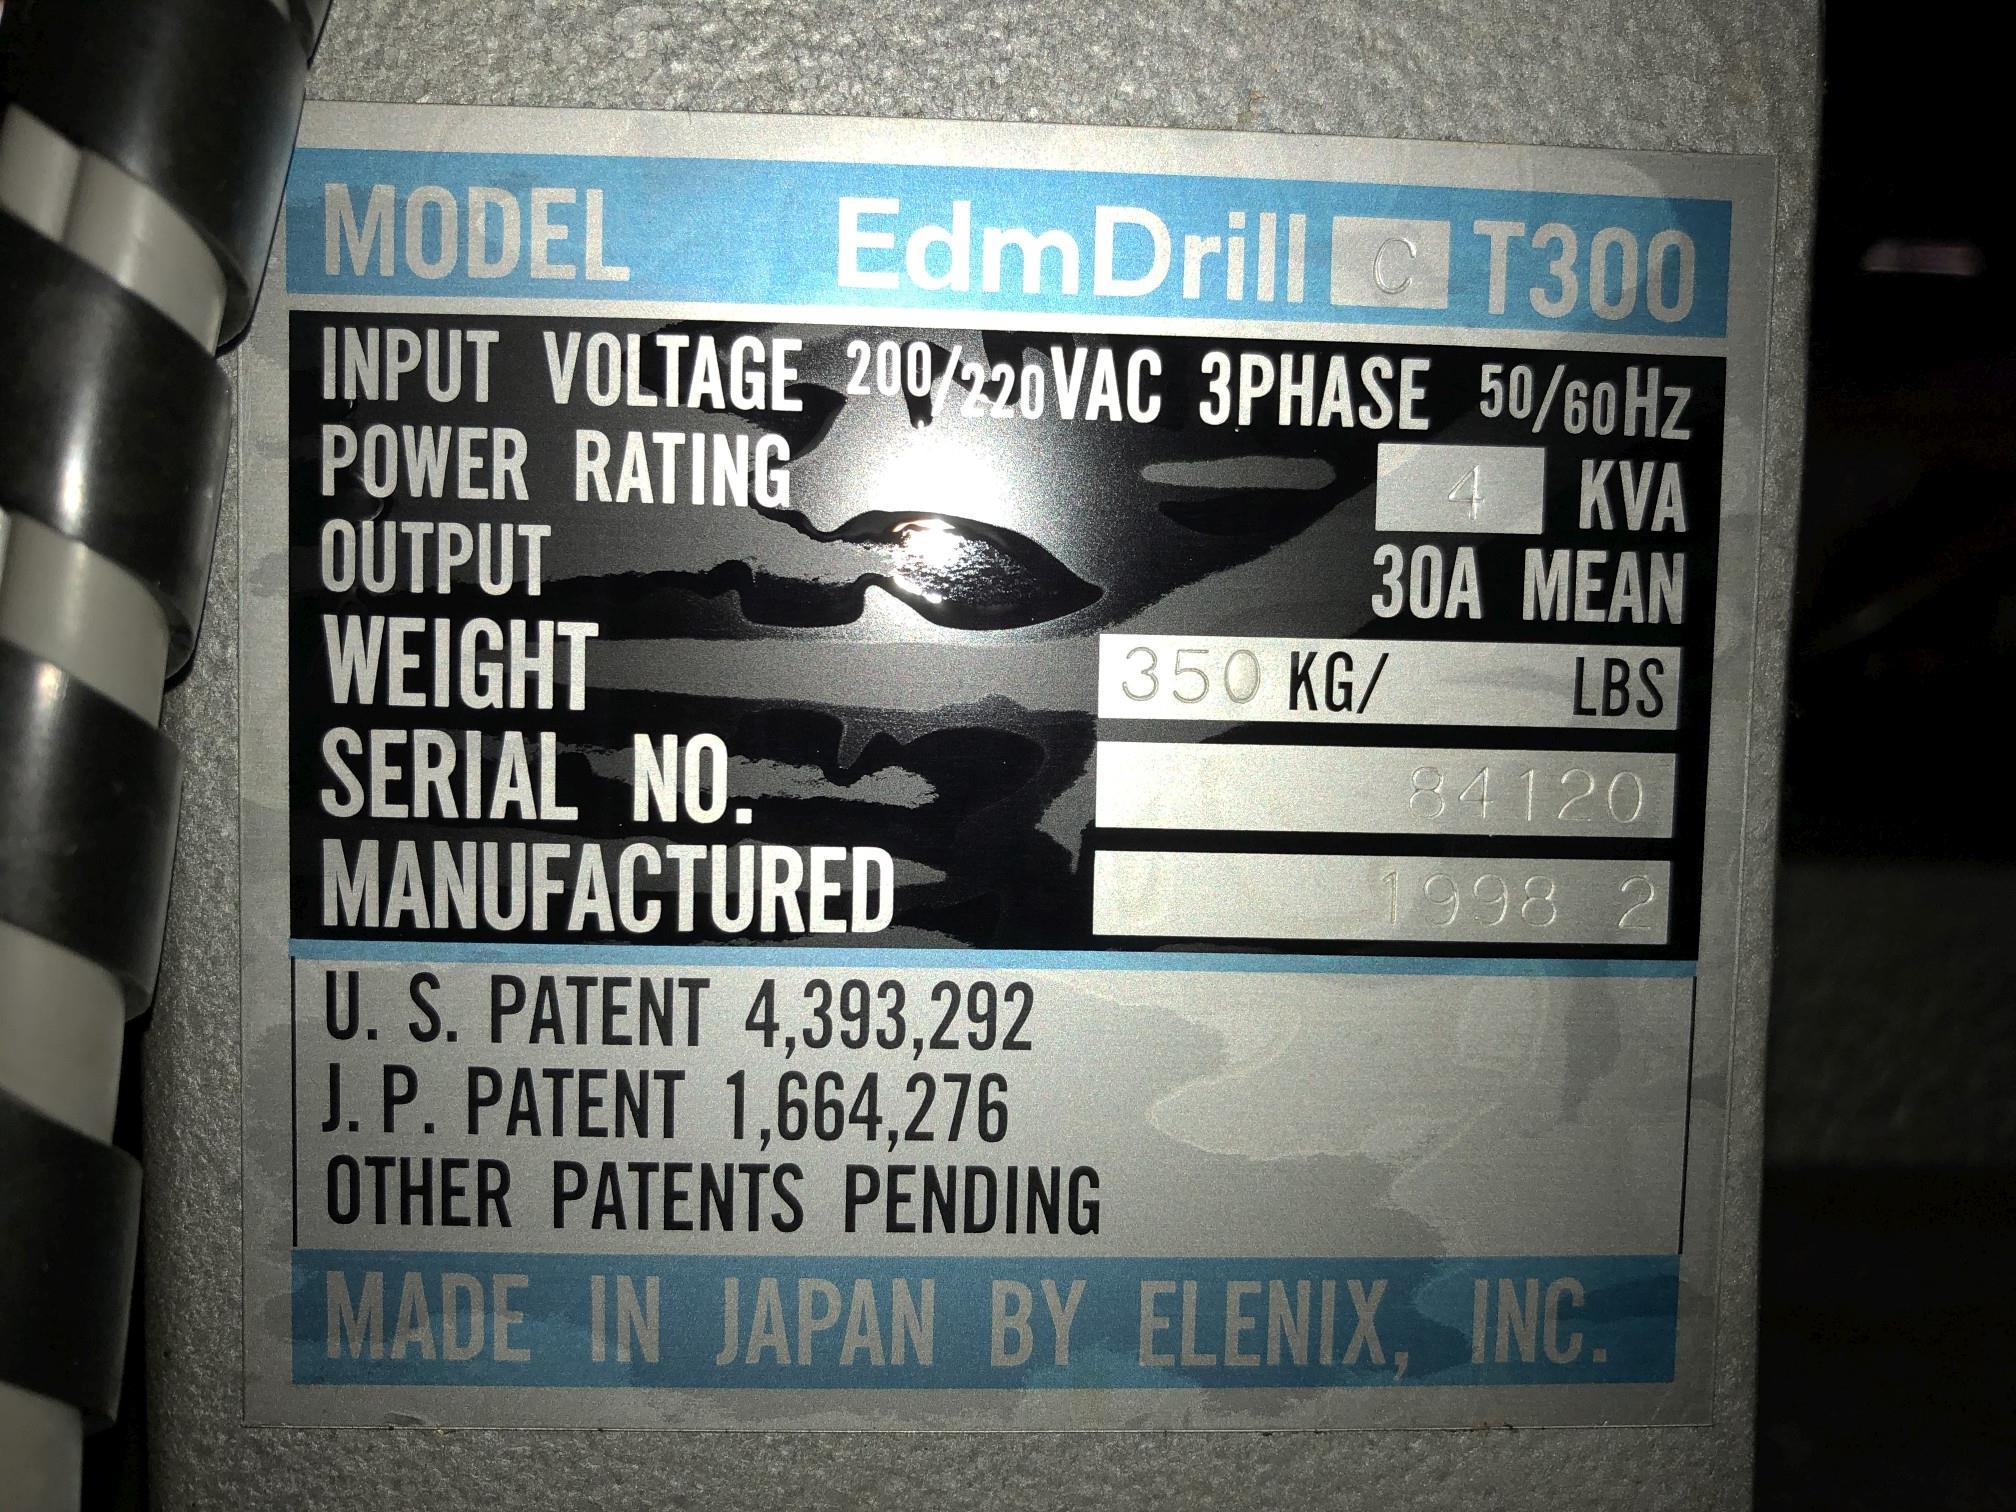 1998 Elenix Small Hole EDM Drill - Image 13 of 13